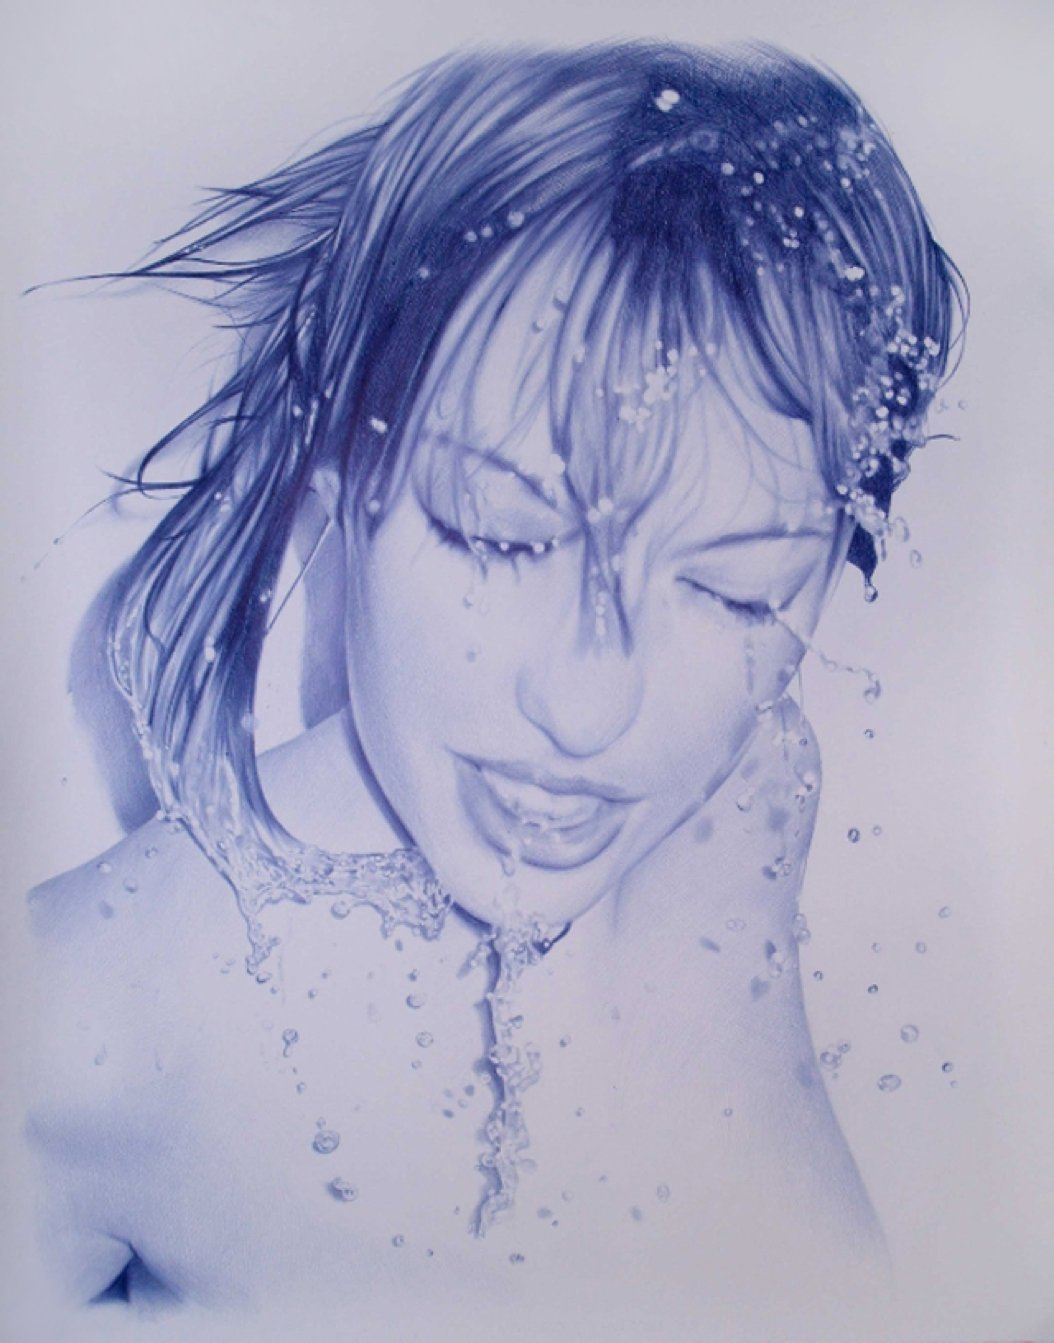 juan-francisco-cavas-realismo-caneta-esferografica-bic-oleo-sobre-tela-pintura-dionisio-arte-12.jpg